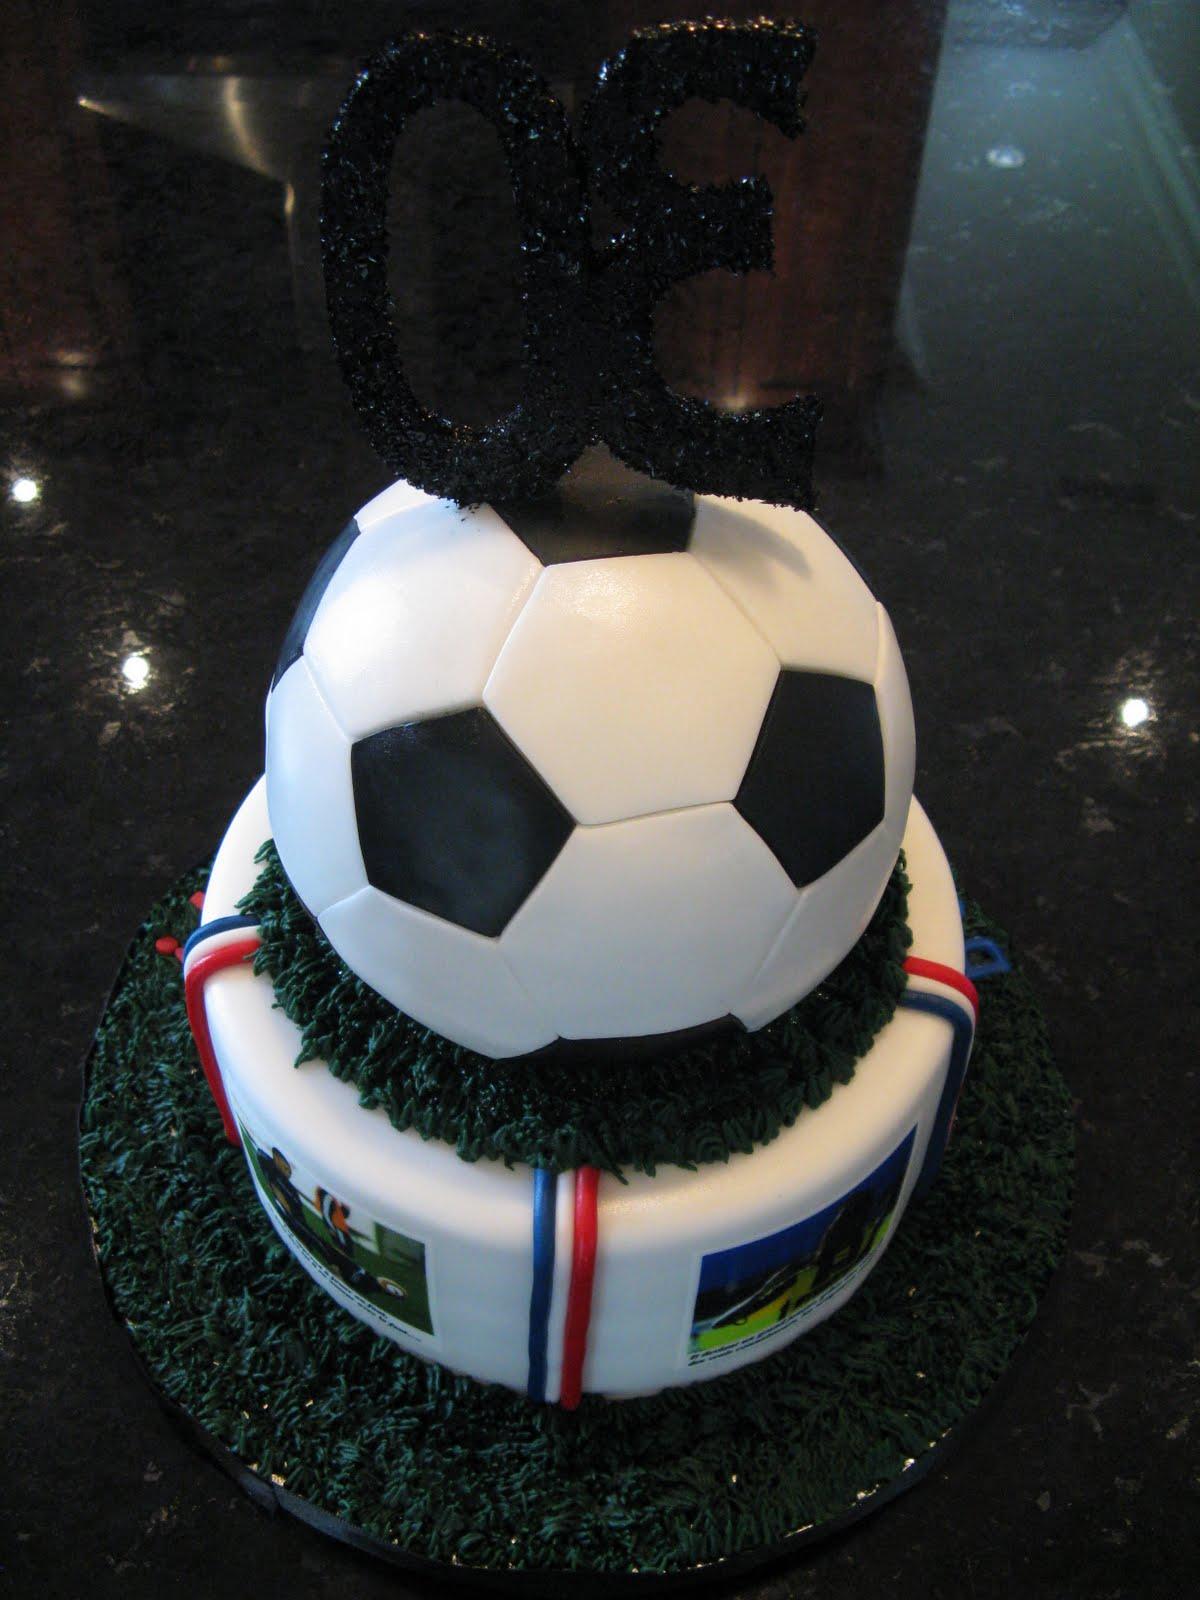 G teaux design g teau ballon soccer 30 ans 30 th soccer ball cake - Image gateau anniversaire 30 ans ...